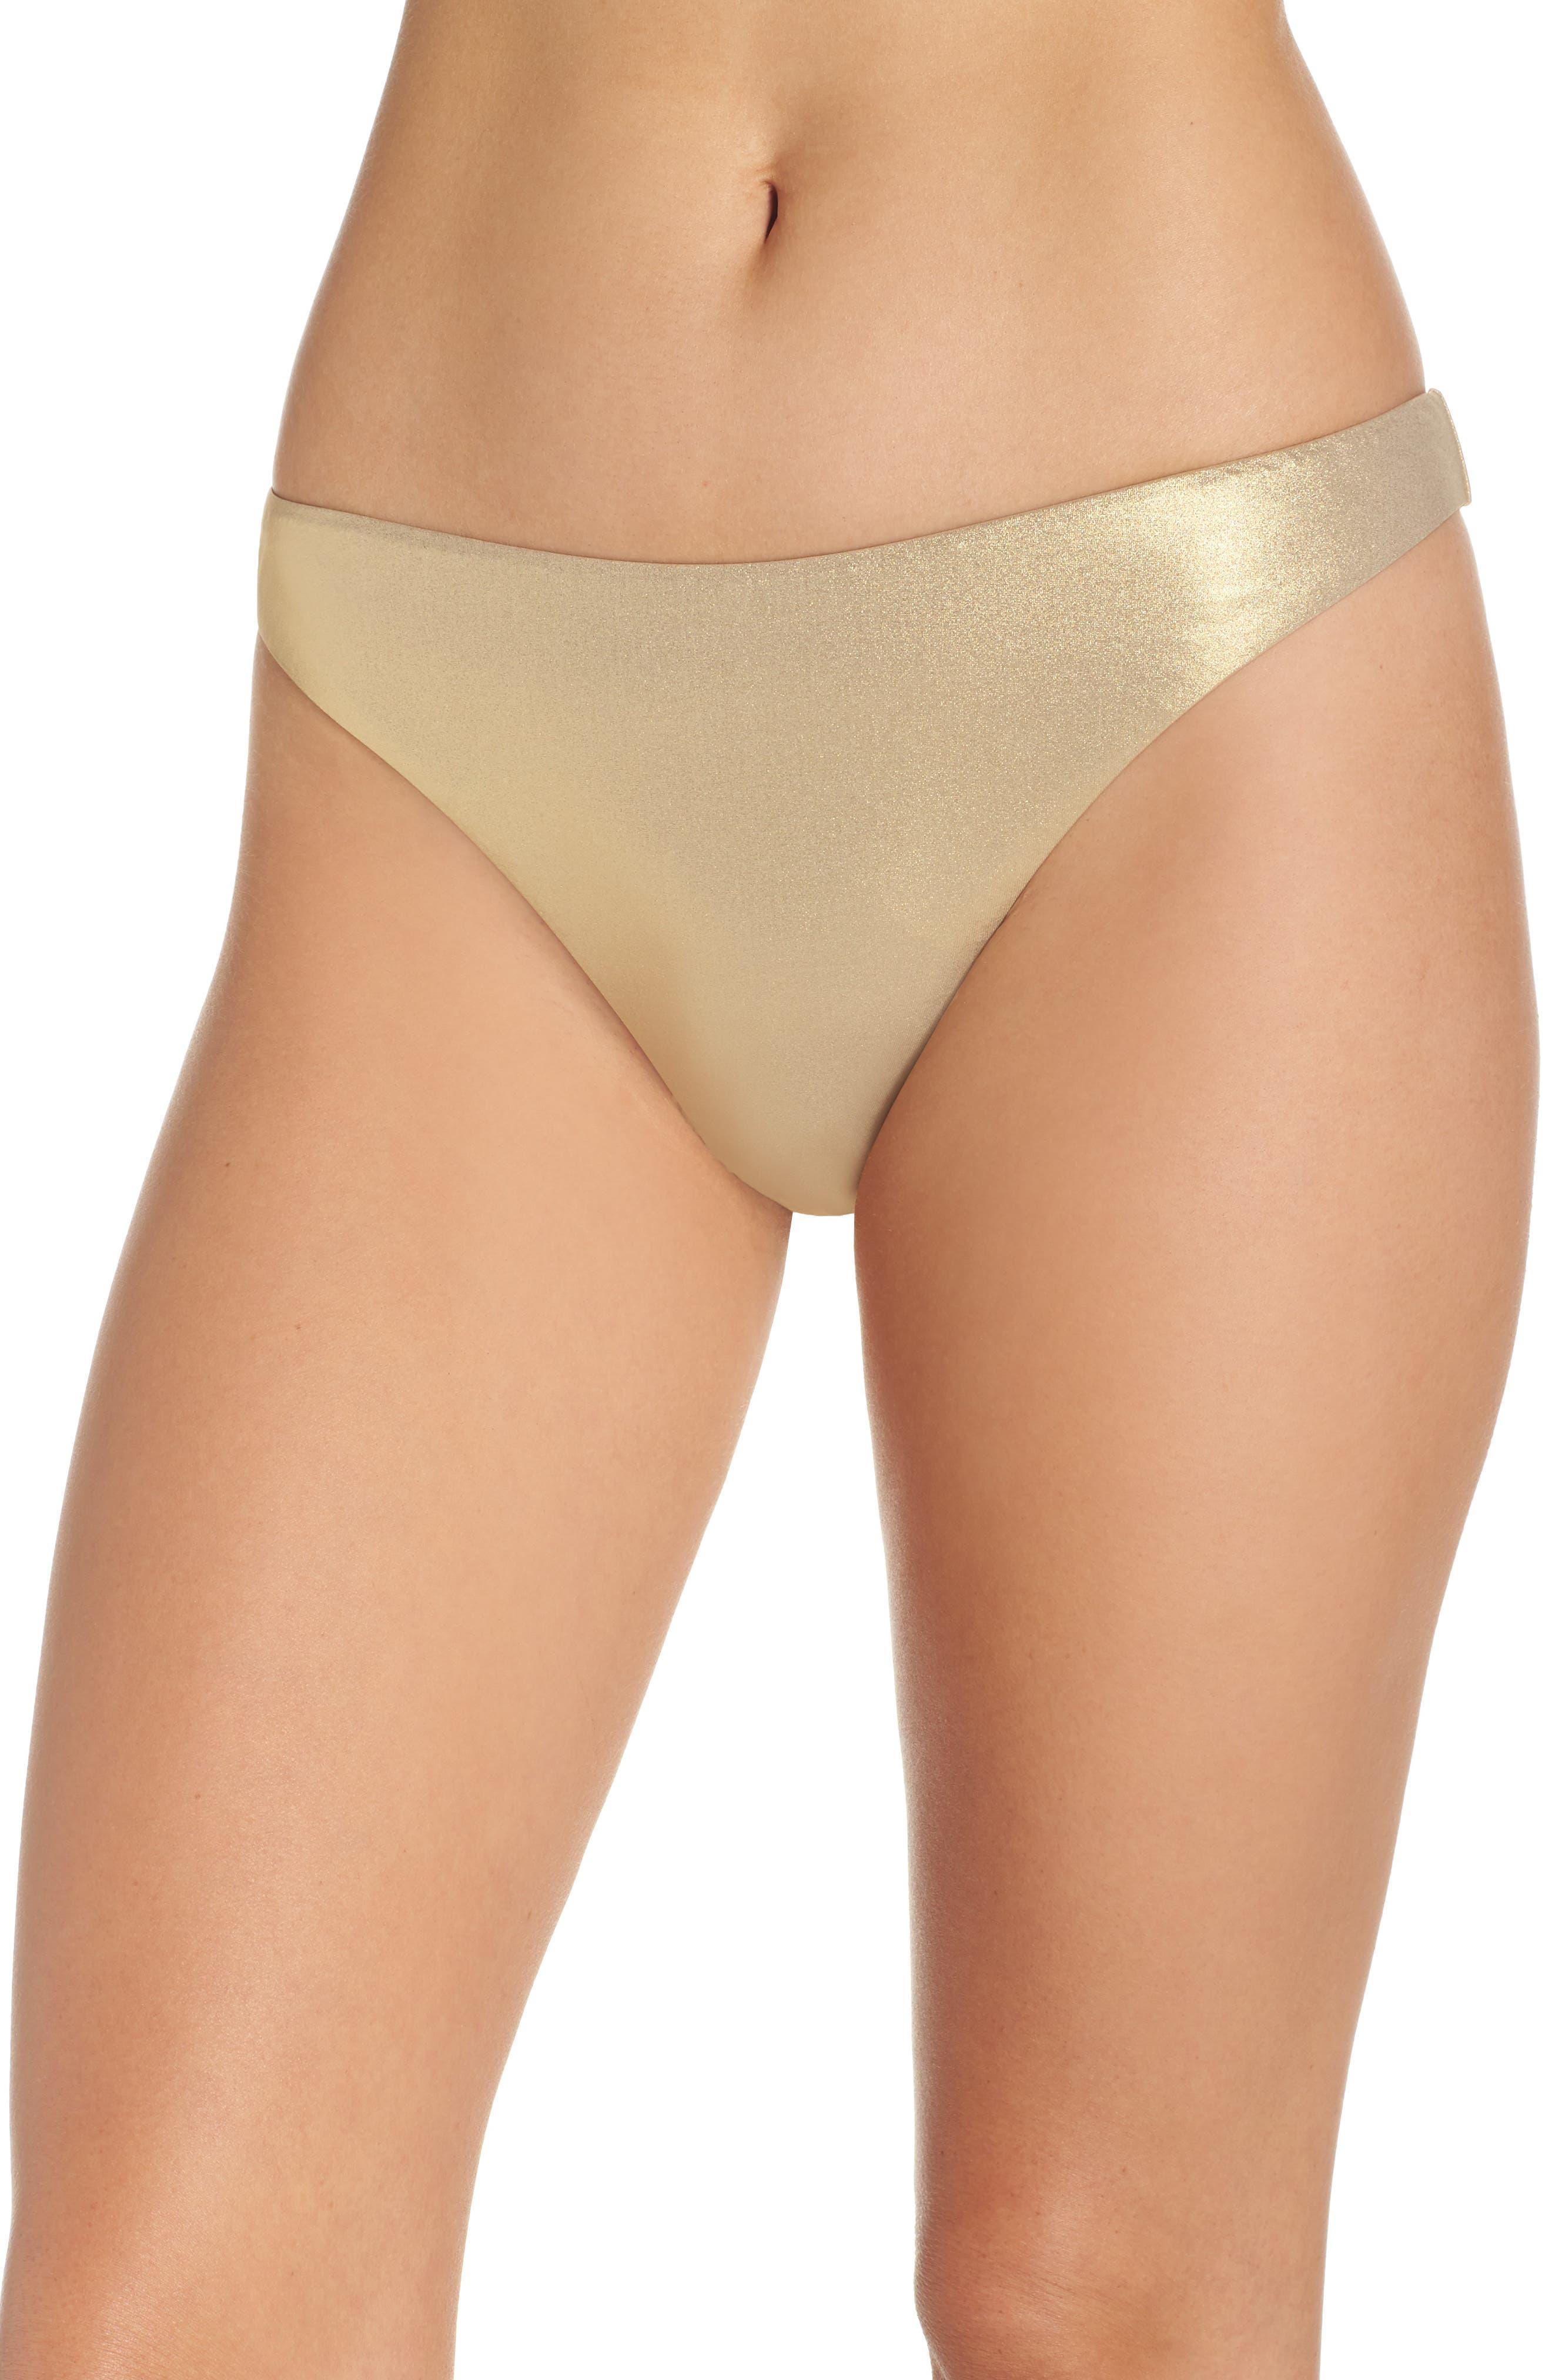 Alternate Image 1 Selected - Trina Turk Golden Medallion Bikini Bottoms